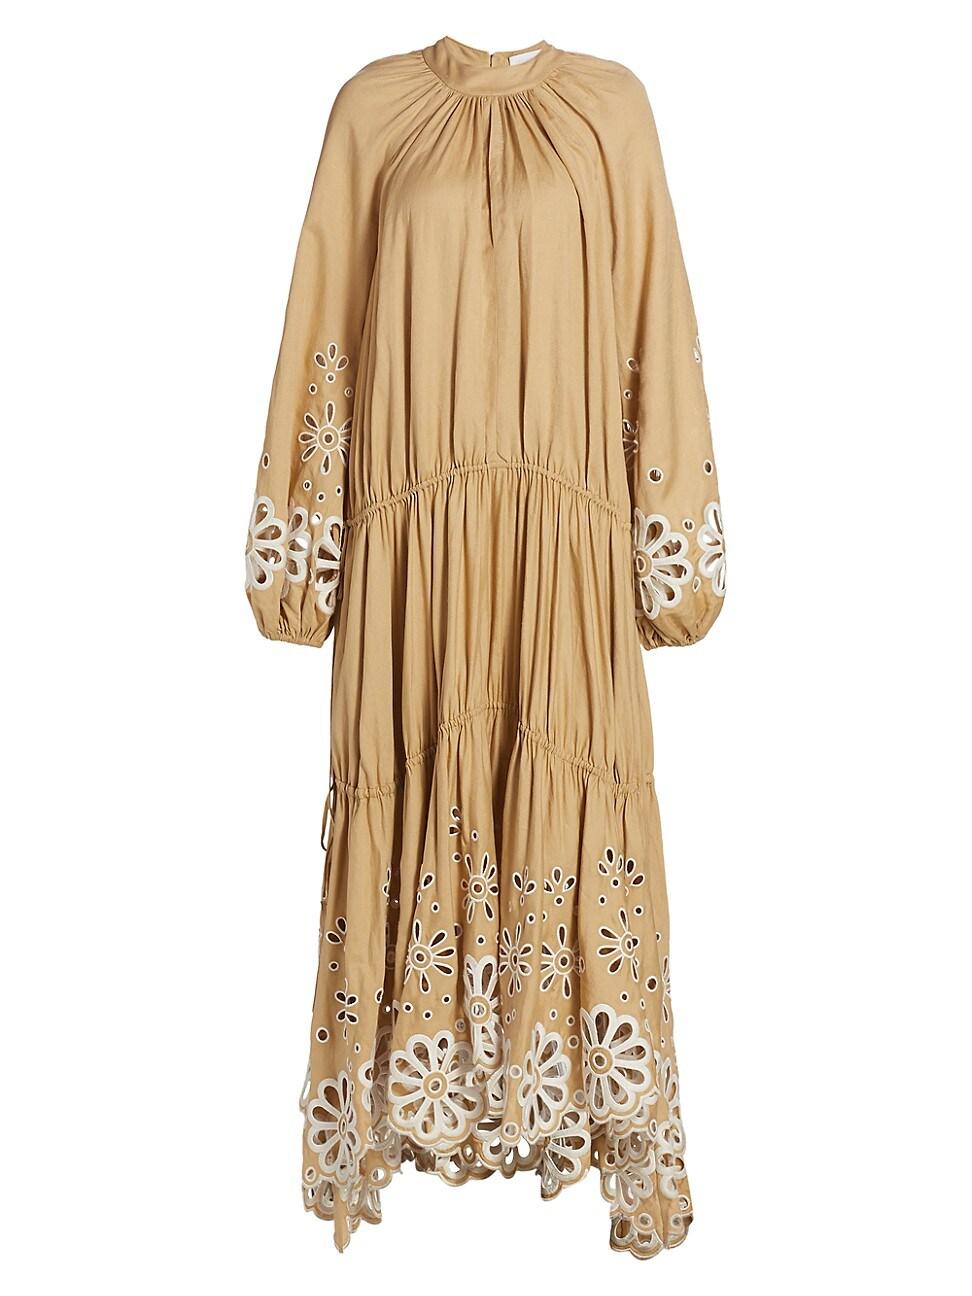 Jonathan Simkhai WOMEN'S ANISA BRODERIE ANGLAISE CASCADE MAXI DRESS